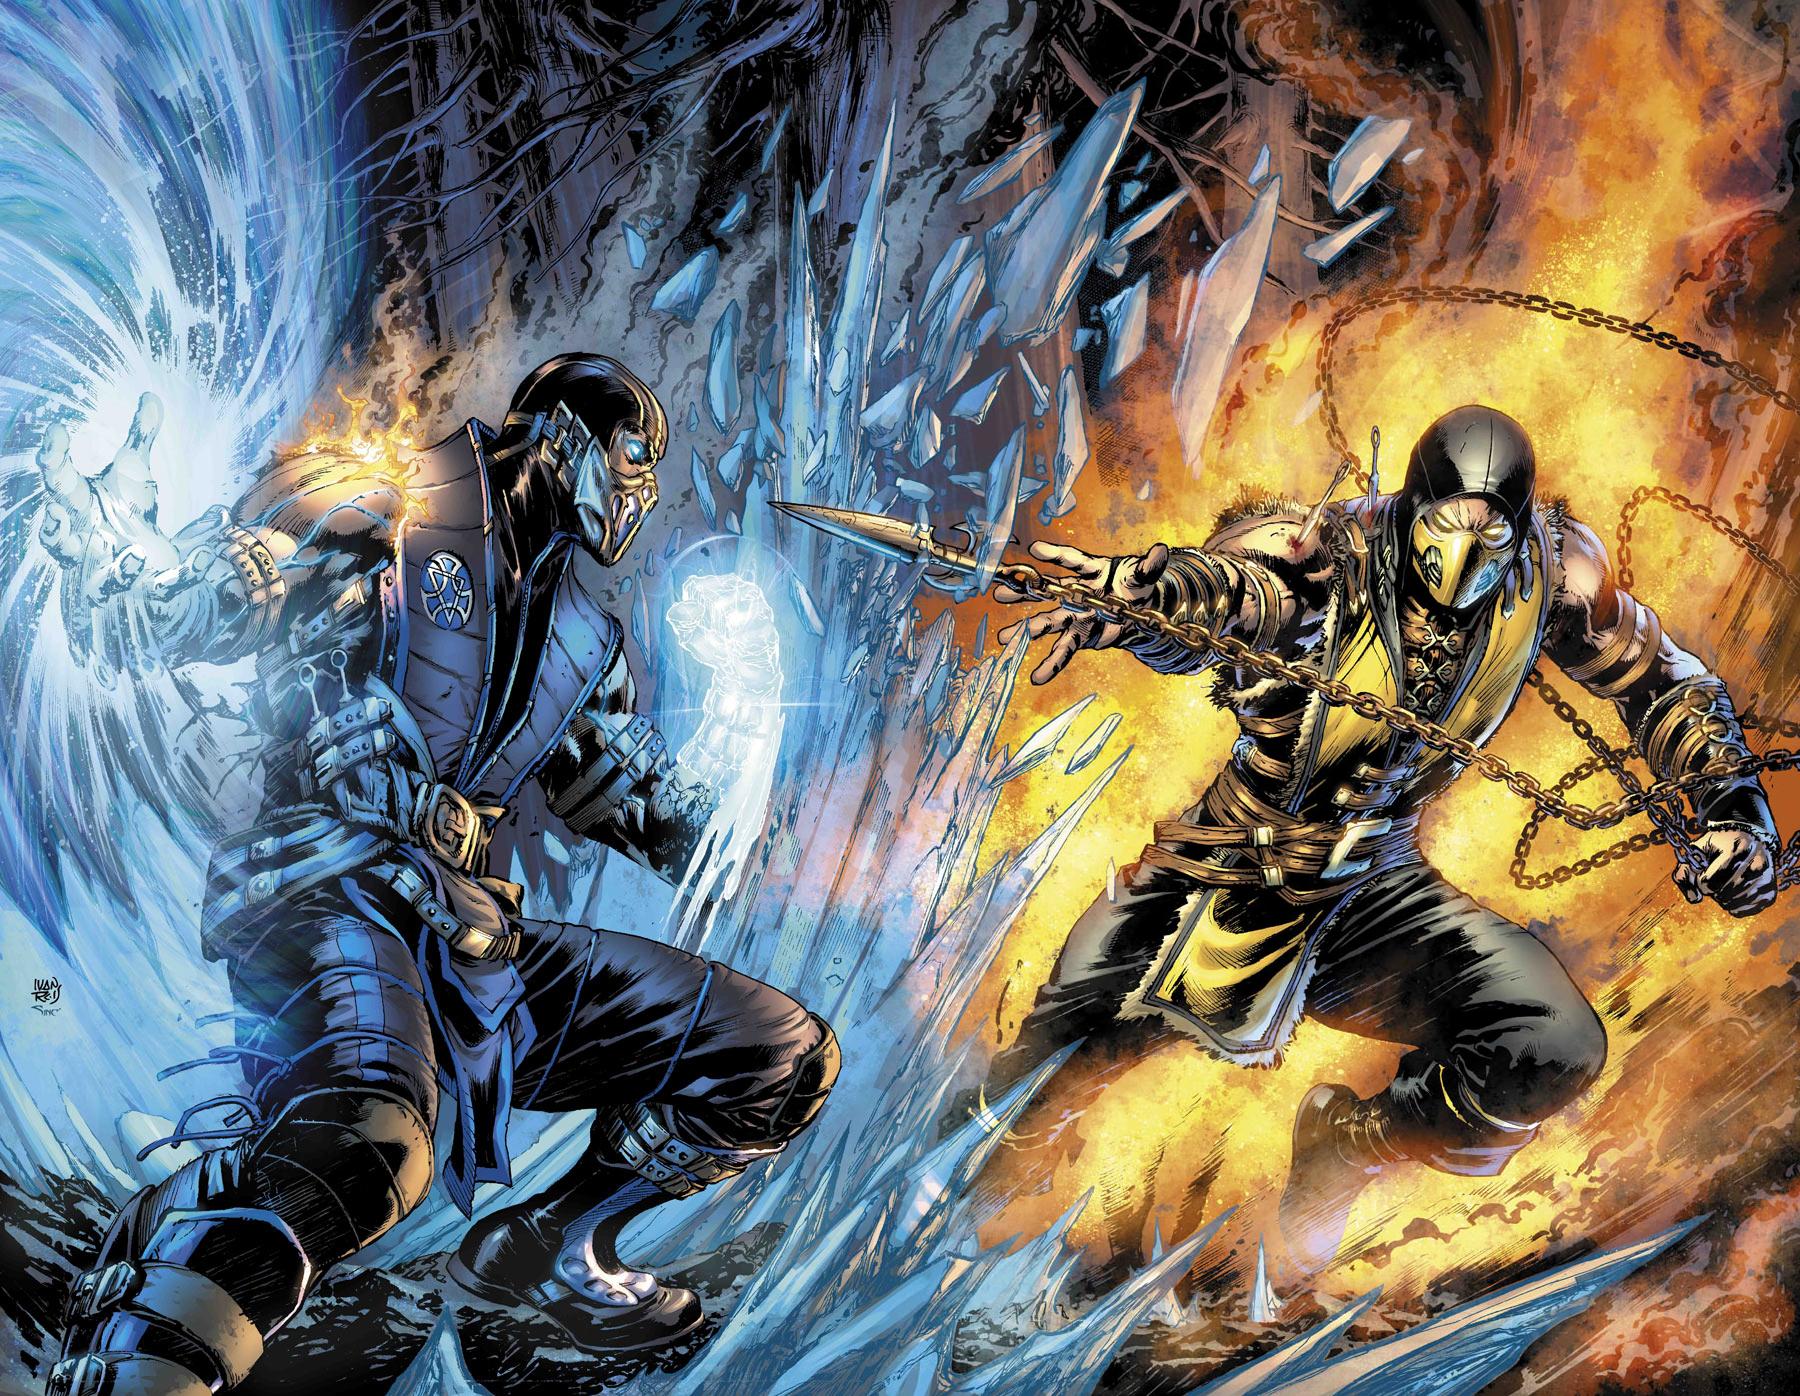 Mortal Kombat X Sub Zero Vs Scorpion By Orochimaruxdd On Deviantart